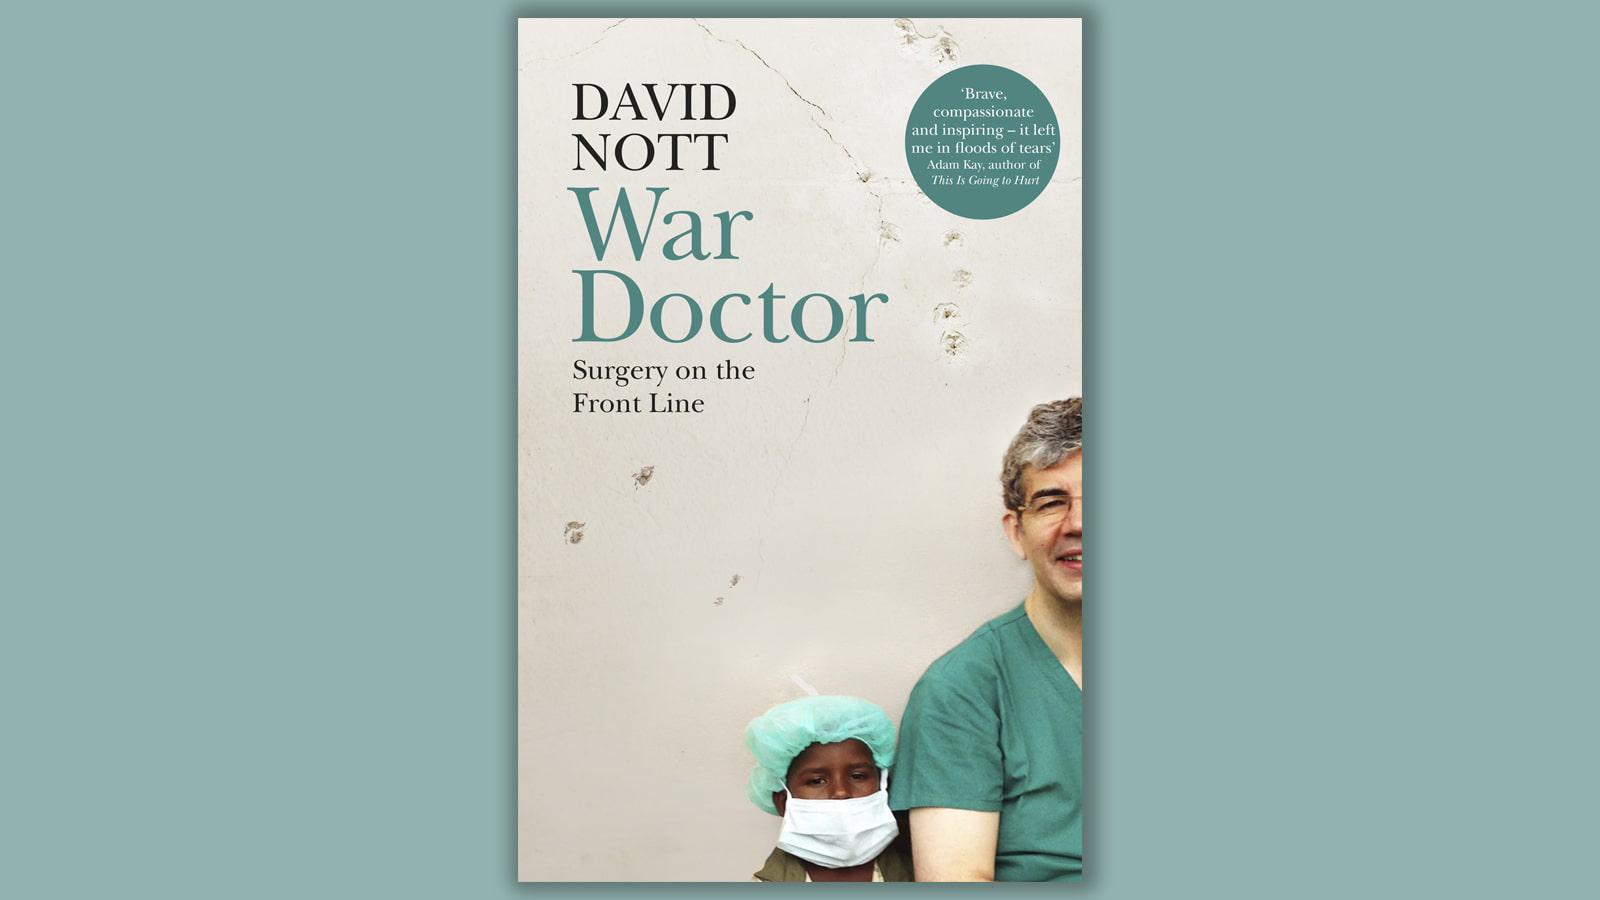 Author of War Doctor, David Nott, in an exclusive interview